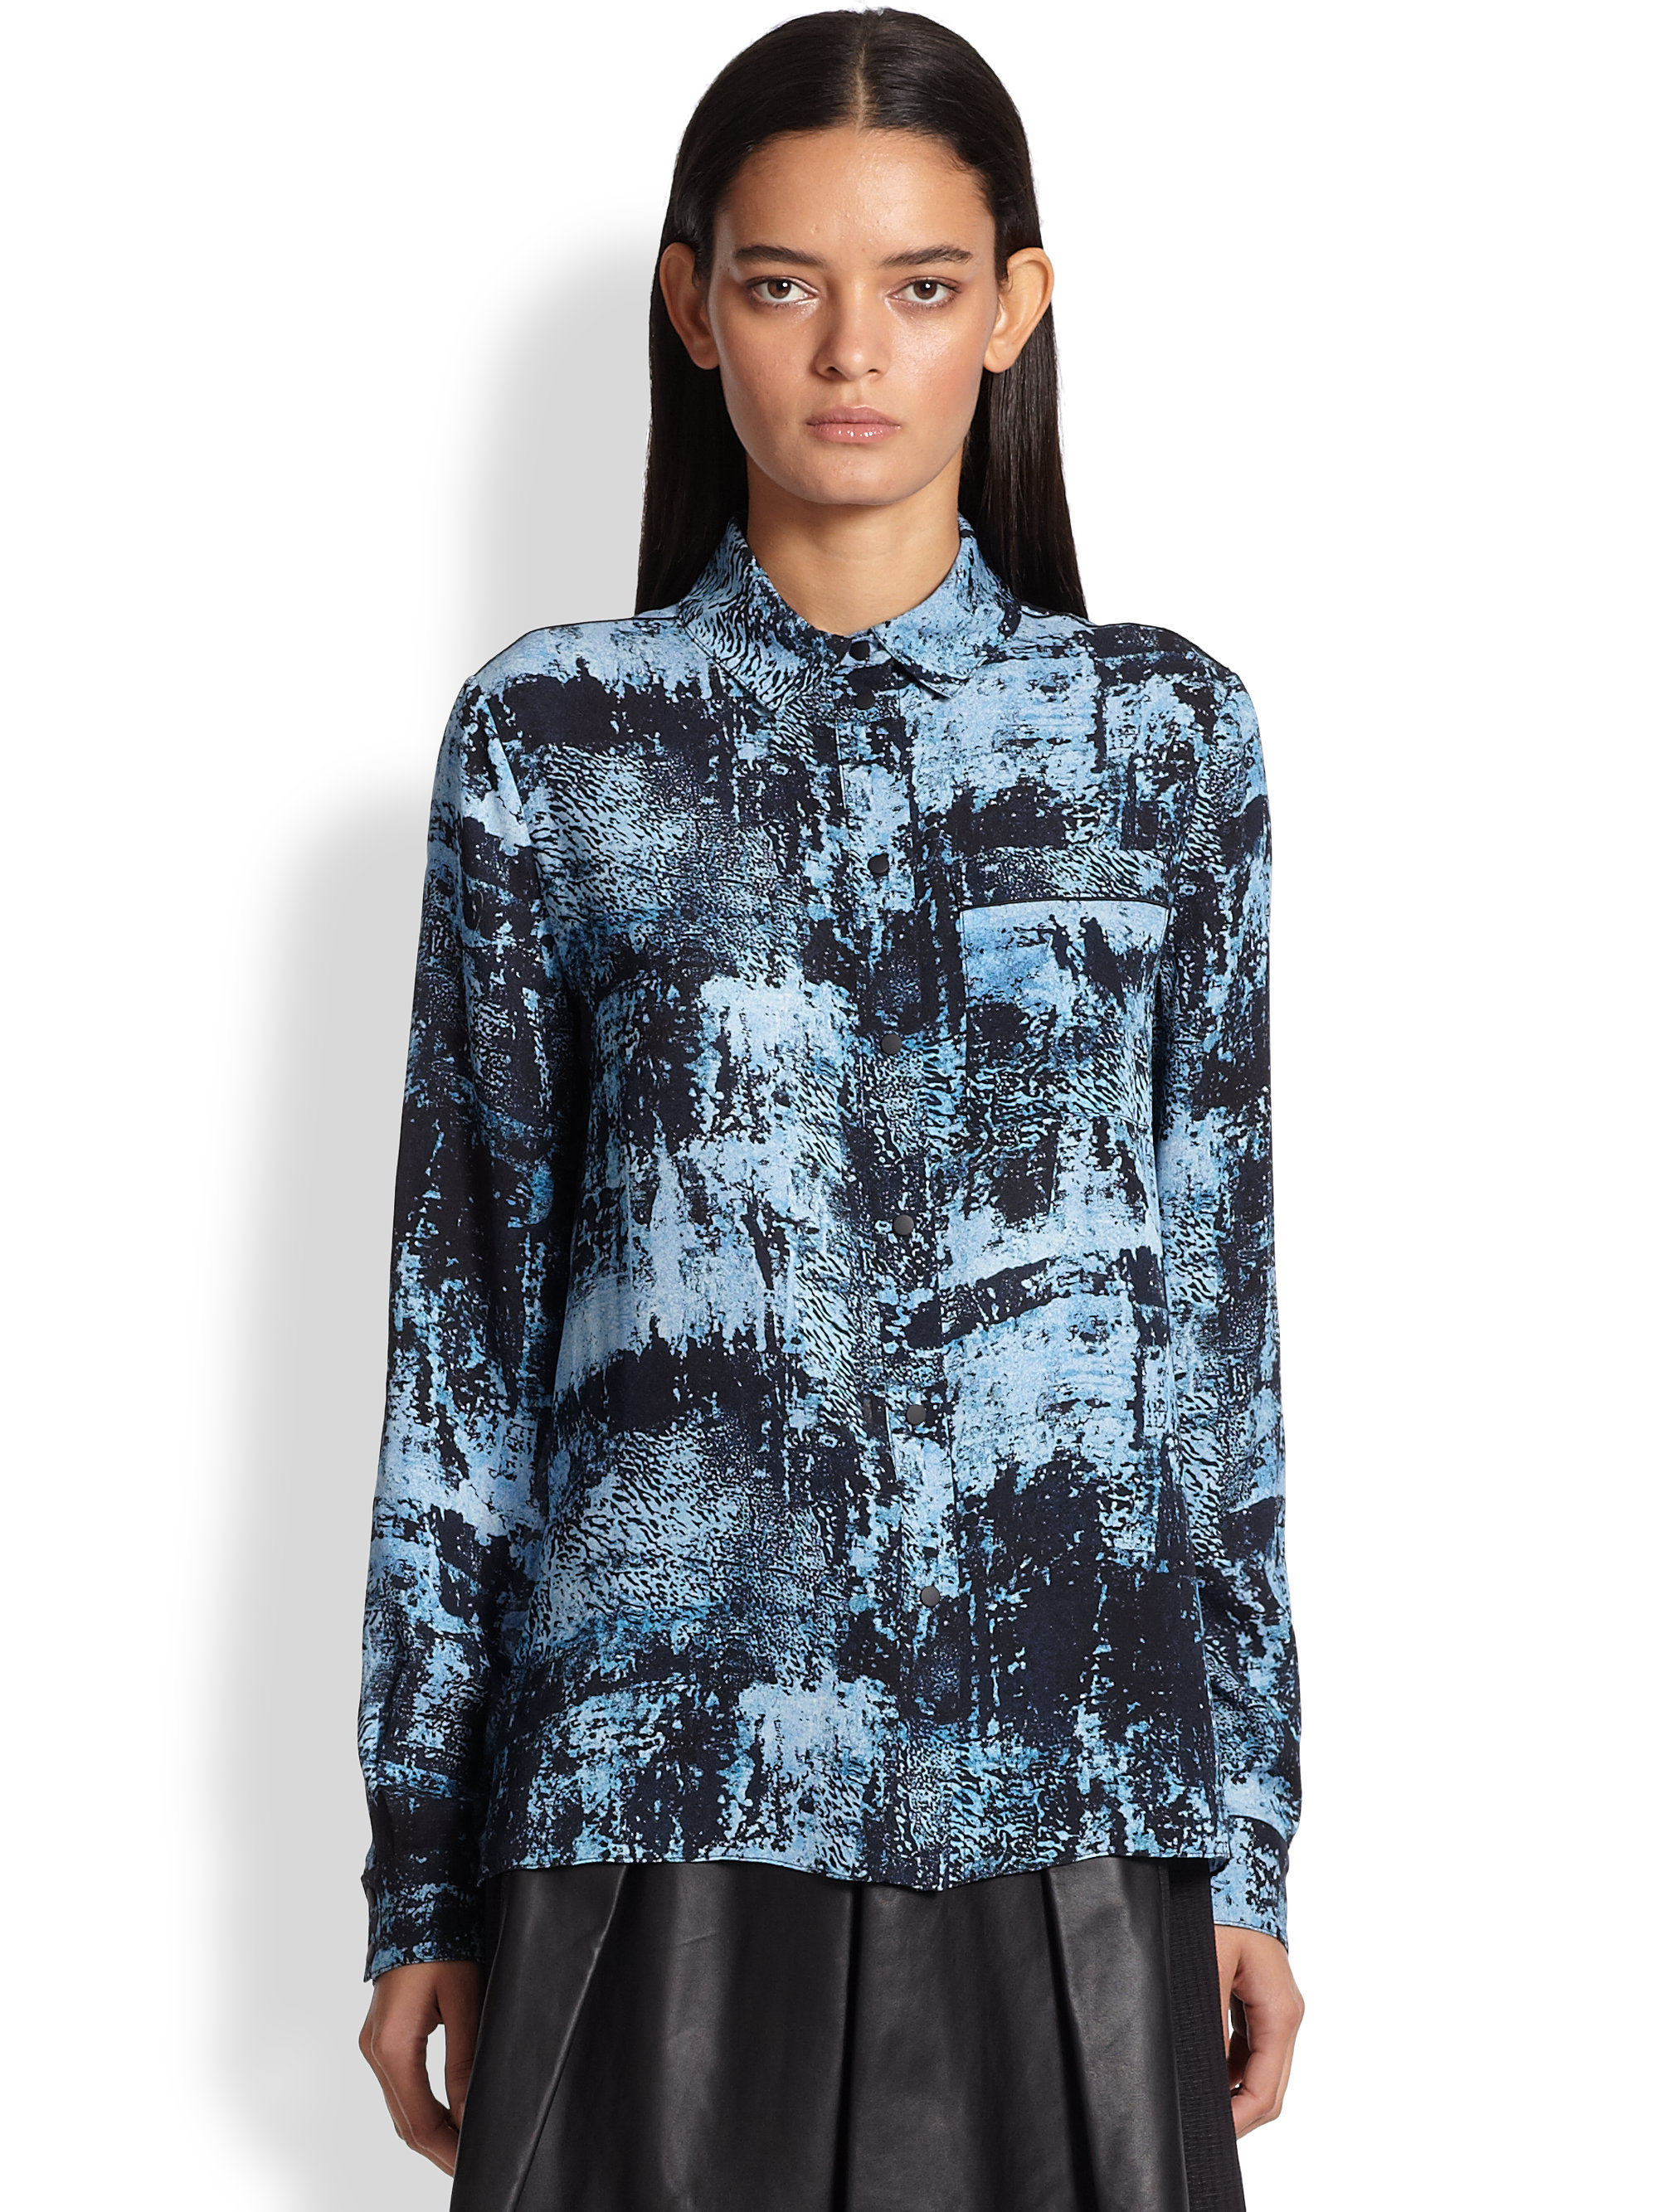 Lyst Print In Proenza Blue Schouler Silk Spray Blouse mNv0w8n